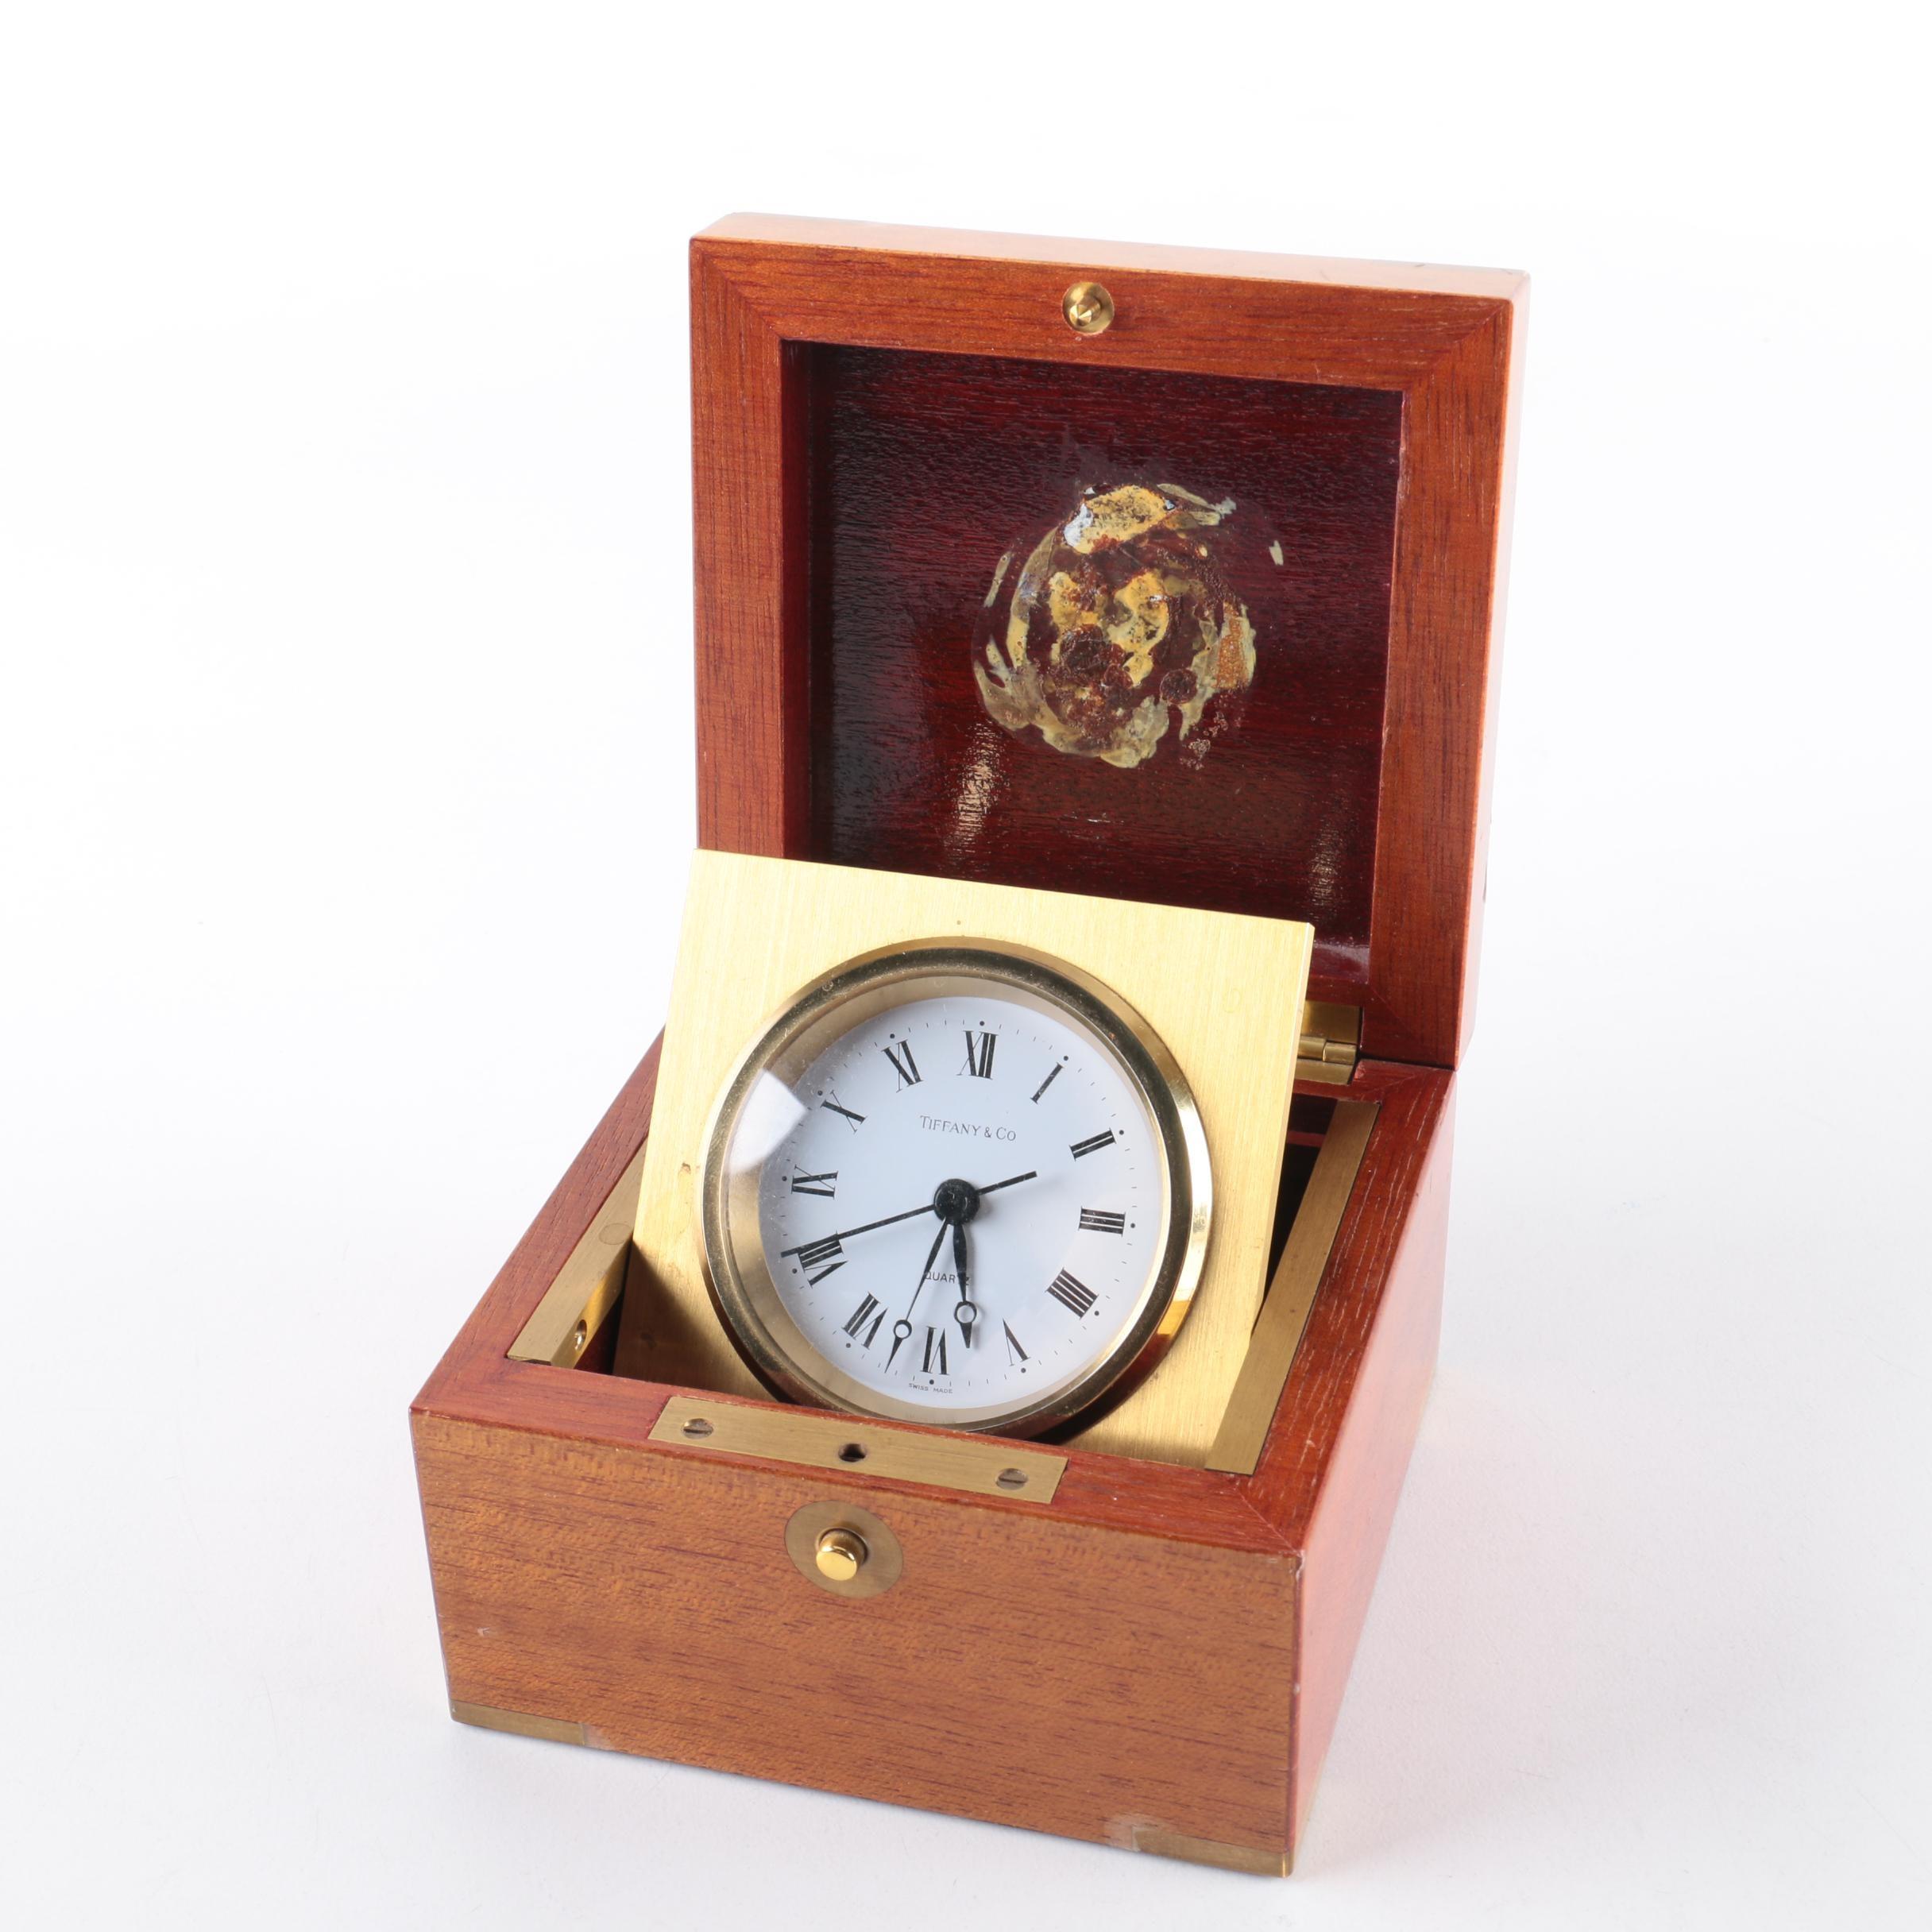 Tiffany & Co Boxed Swing Desk Clock